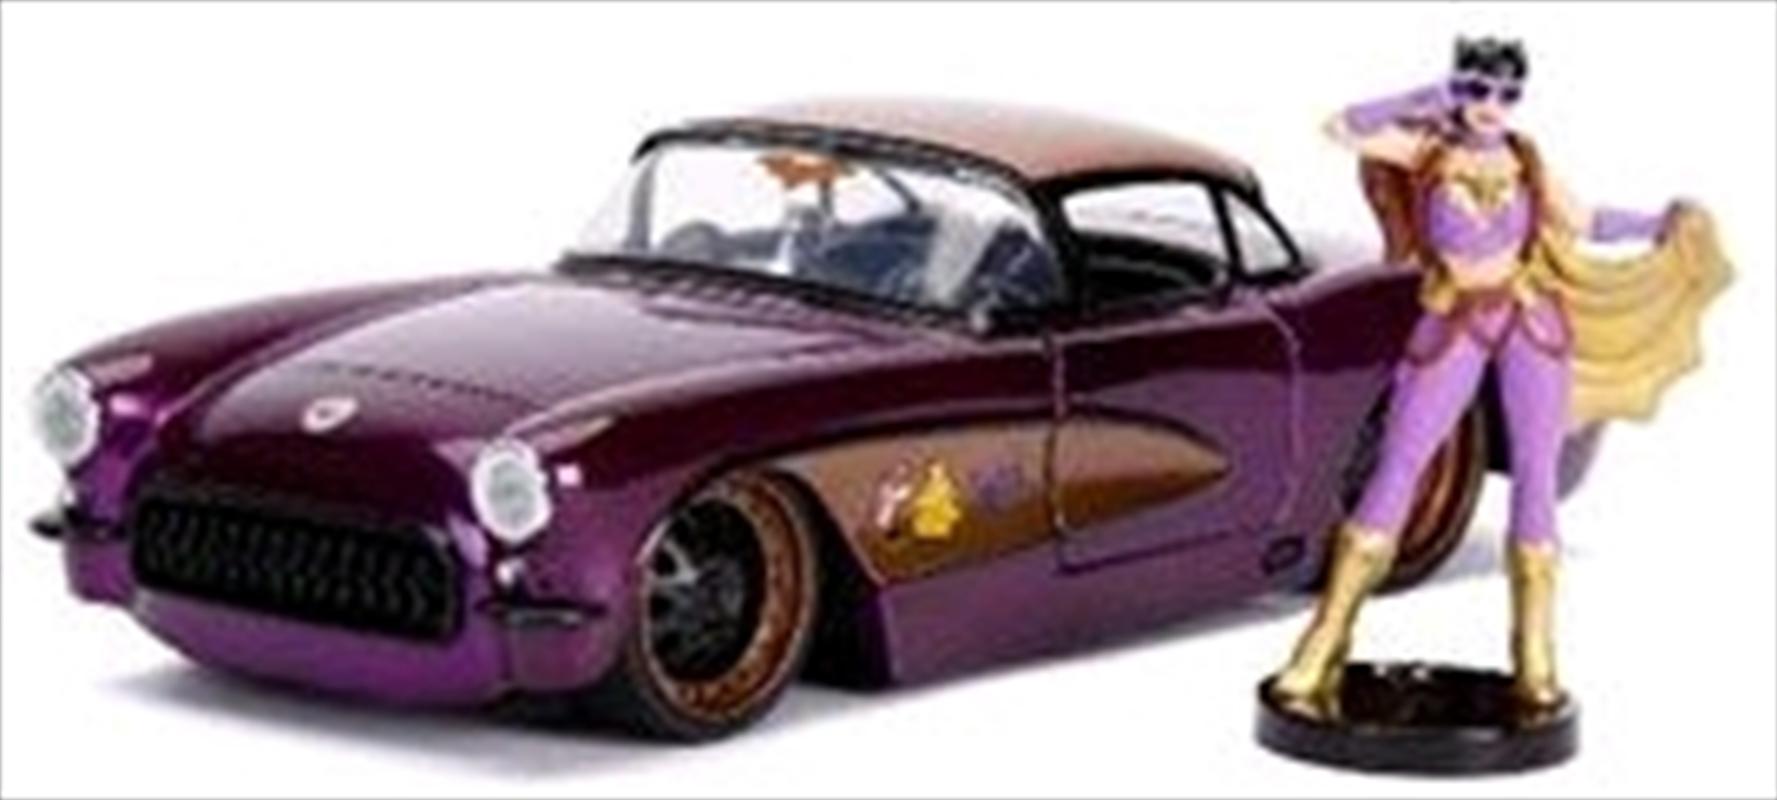 DC Bombshells - Batgirl 1957 Chevy Corvette 1:24 Scale Hollywood Rides Diecast Vehicle   Merchandise